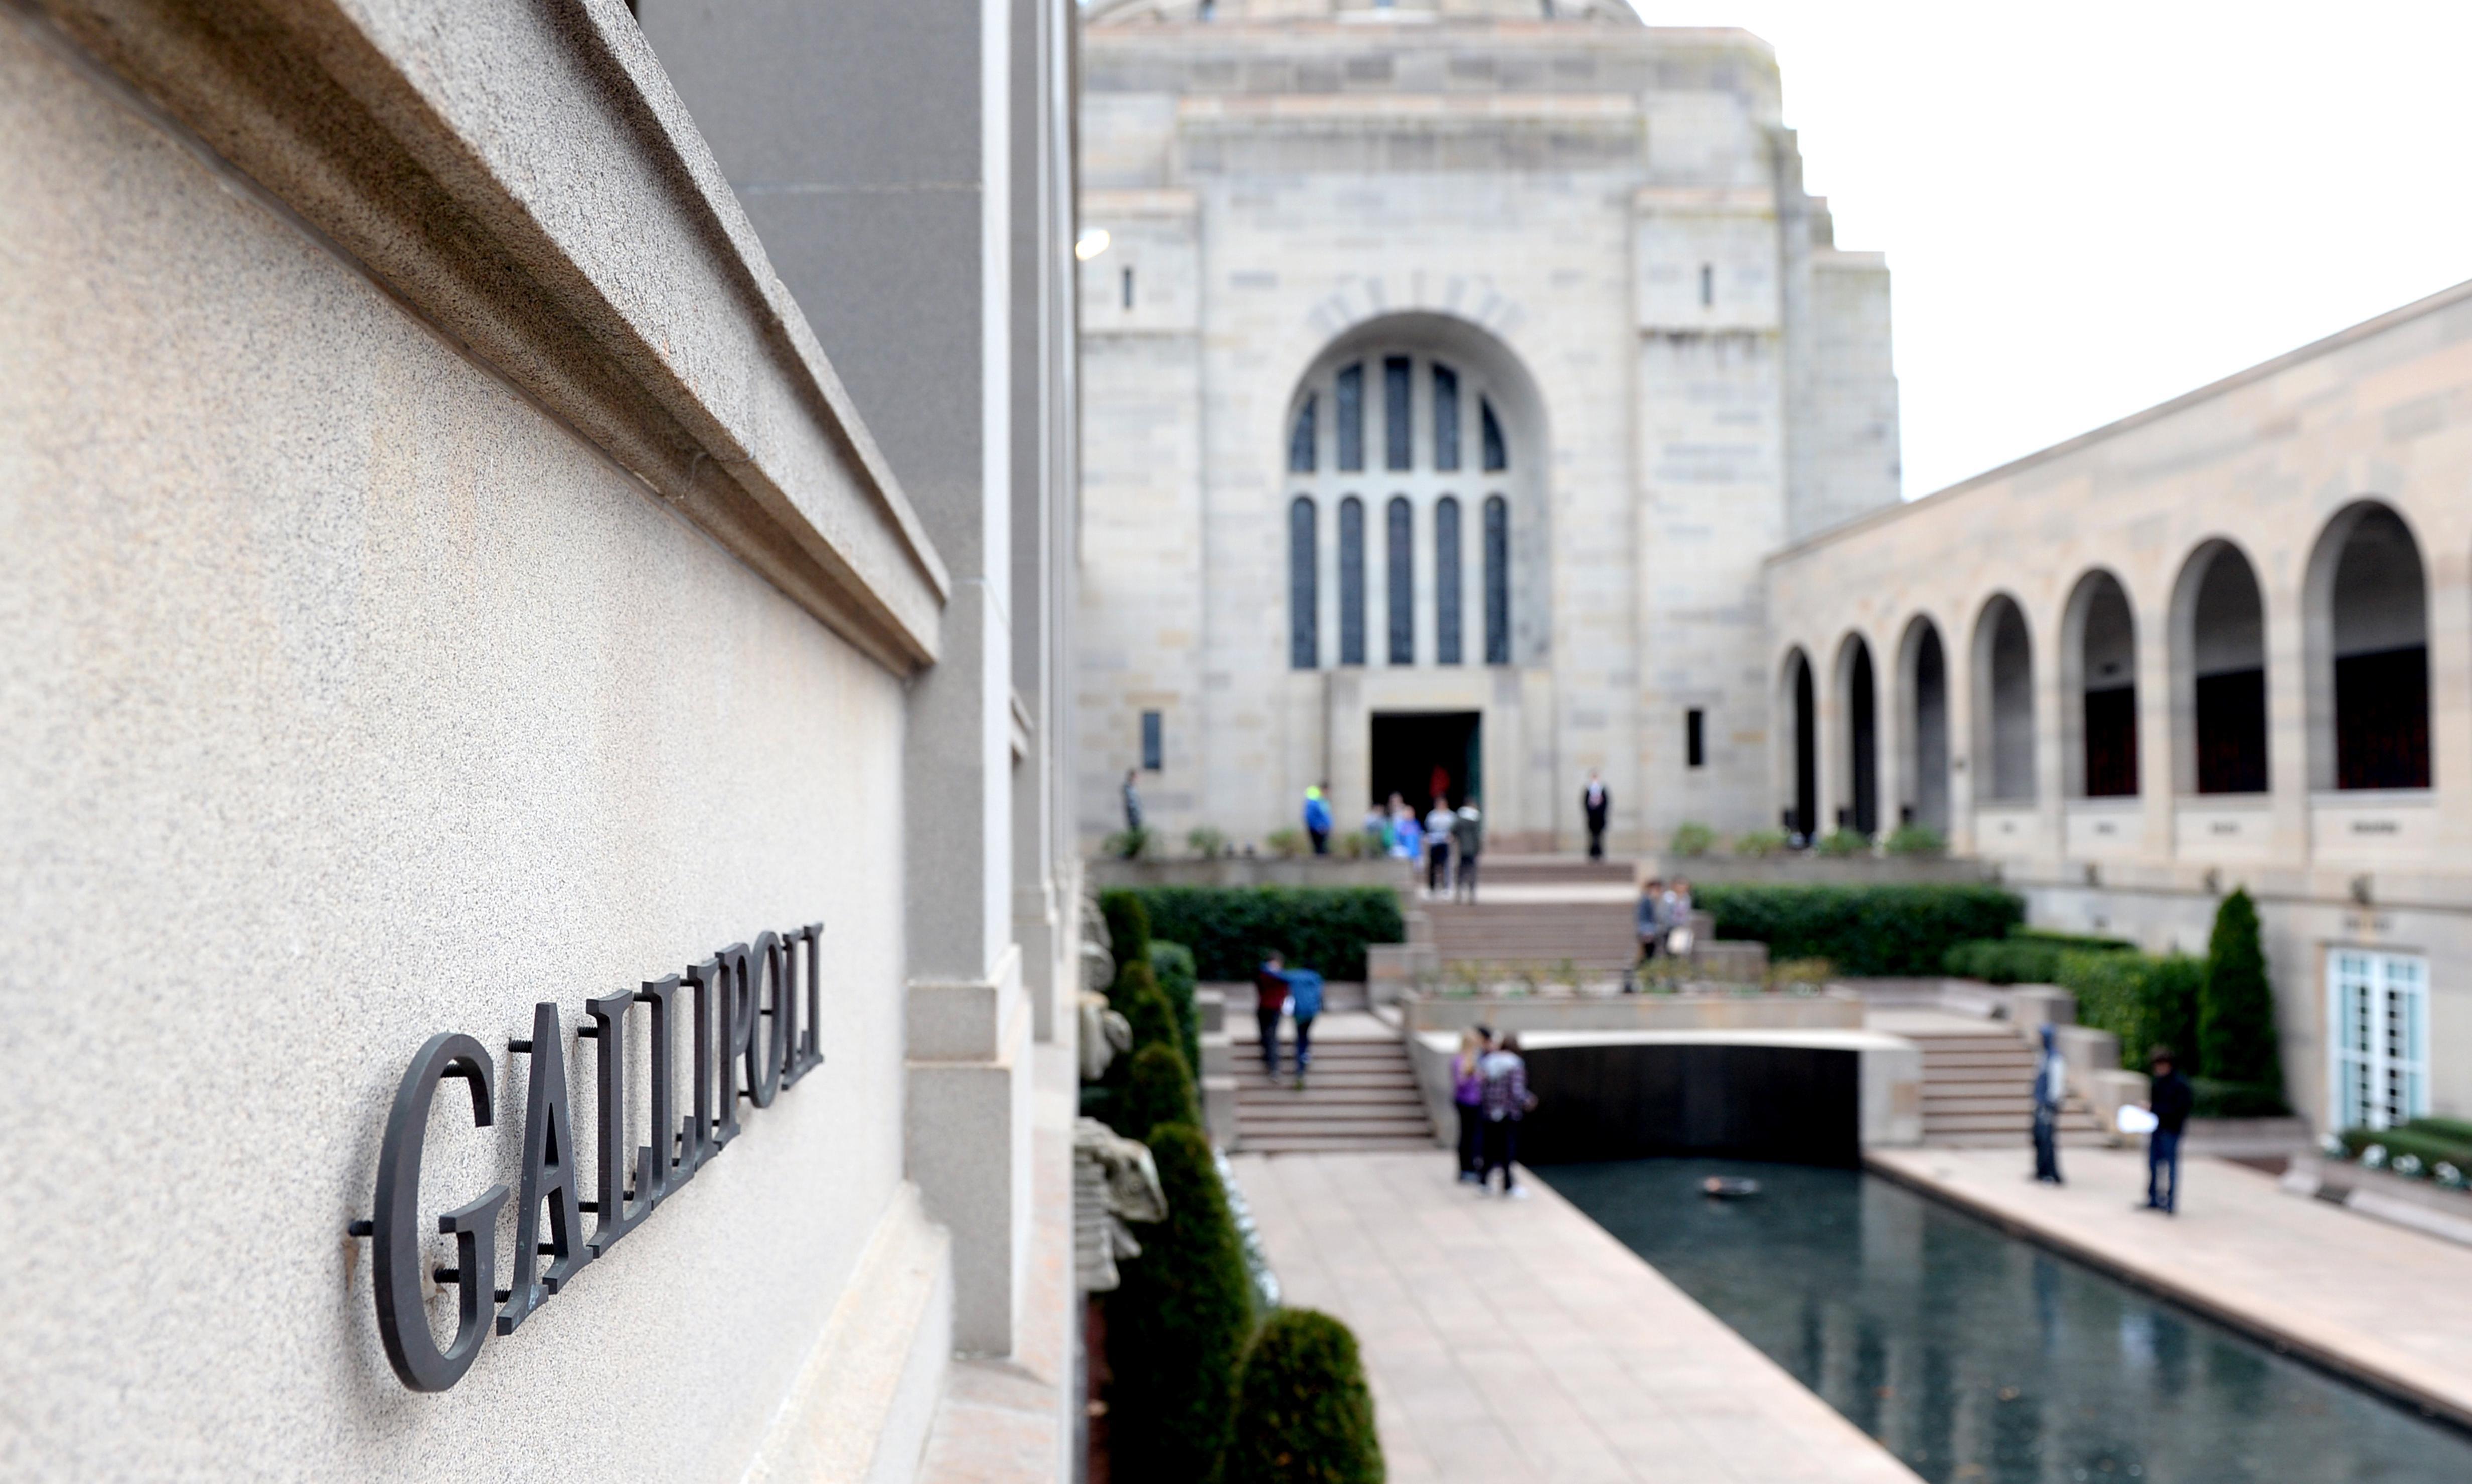 War memorial expansion's opponents say $500m better spent on veterans